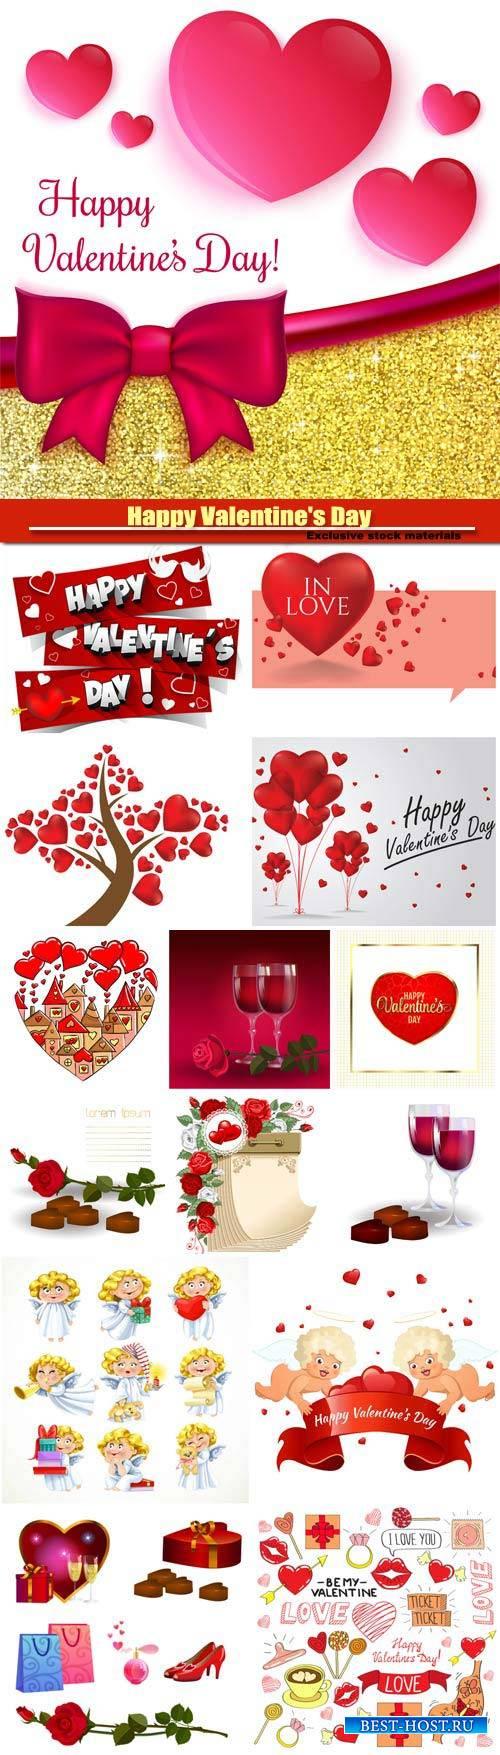 Happy Valentine's Day vector, hearts, romance, love #11